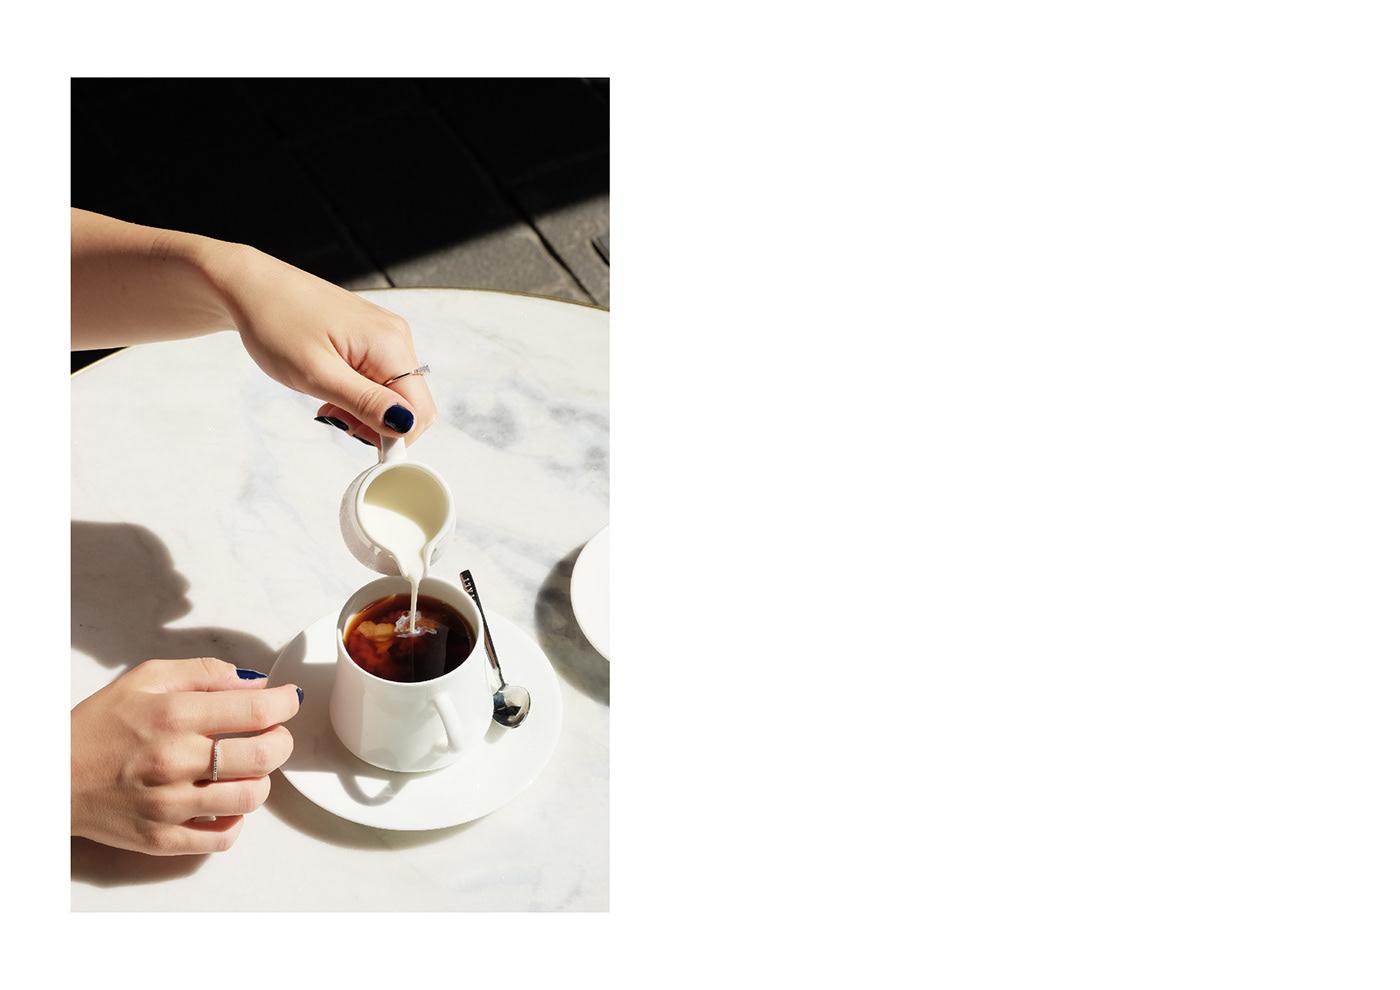 branding  cafebranding   Cafephotography DayLightphotography lifestylephotography productphotography propstyling shooting socialmediaphotography stilllifephotography